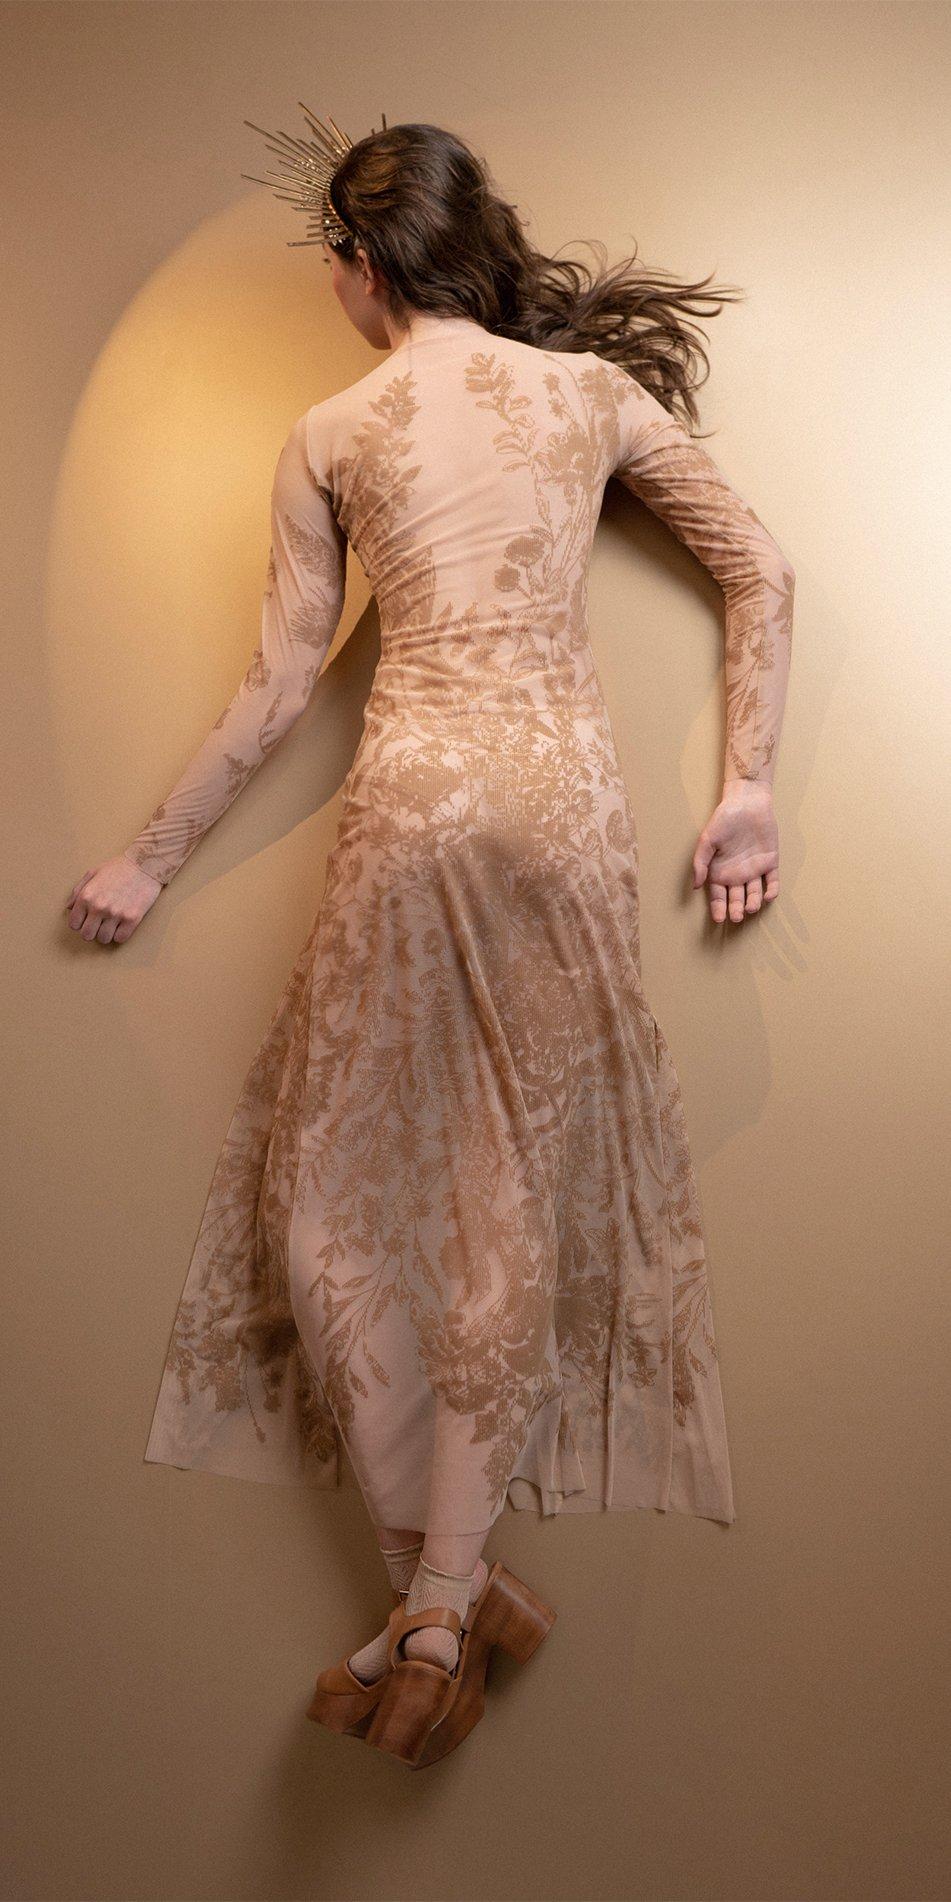 BLOSSOMS nude second skin flock print dress 9